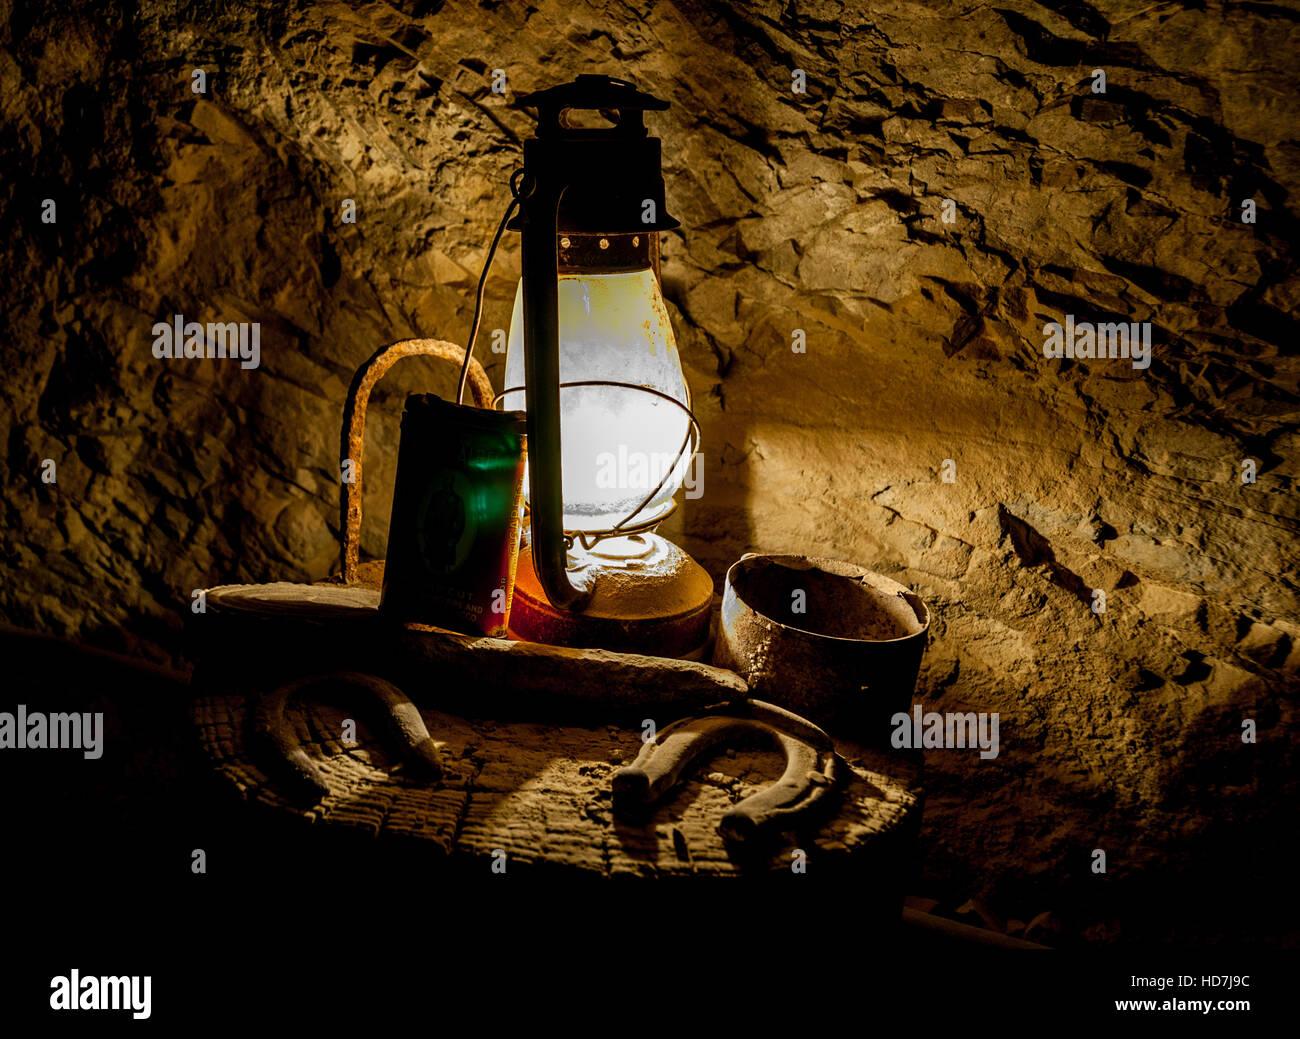 Old kerosene lantern and lucky horseshoe inside Techatticup Mine, a historic gold + silver mine near Eldorado Canyon, - Stock Image